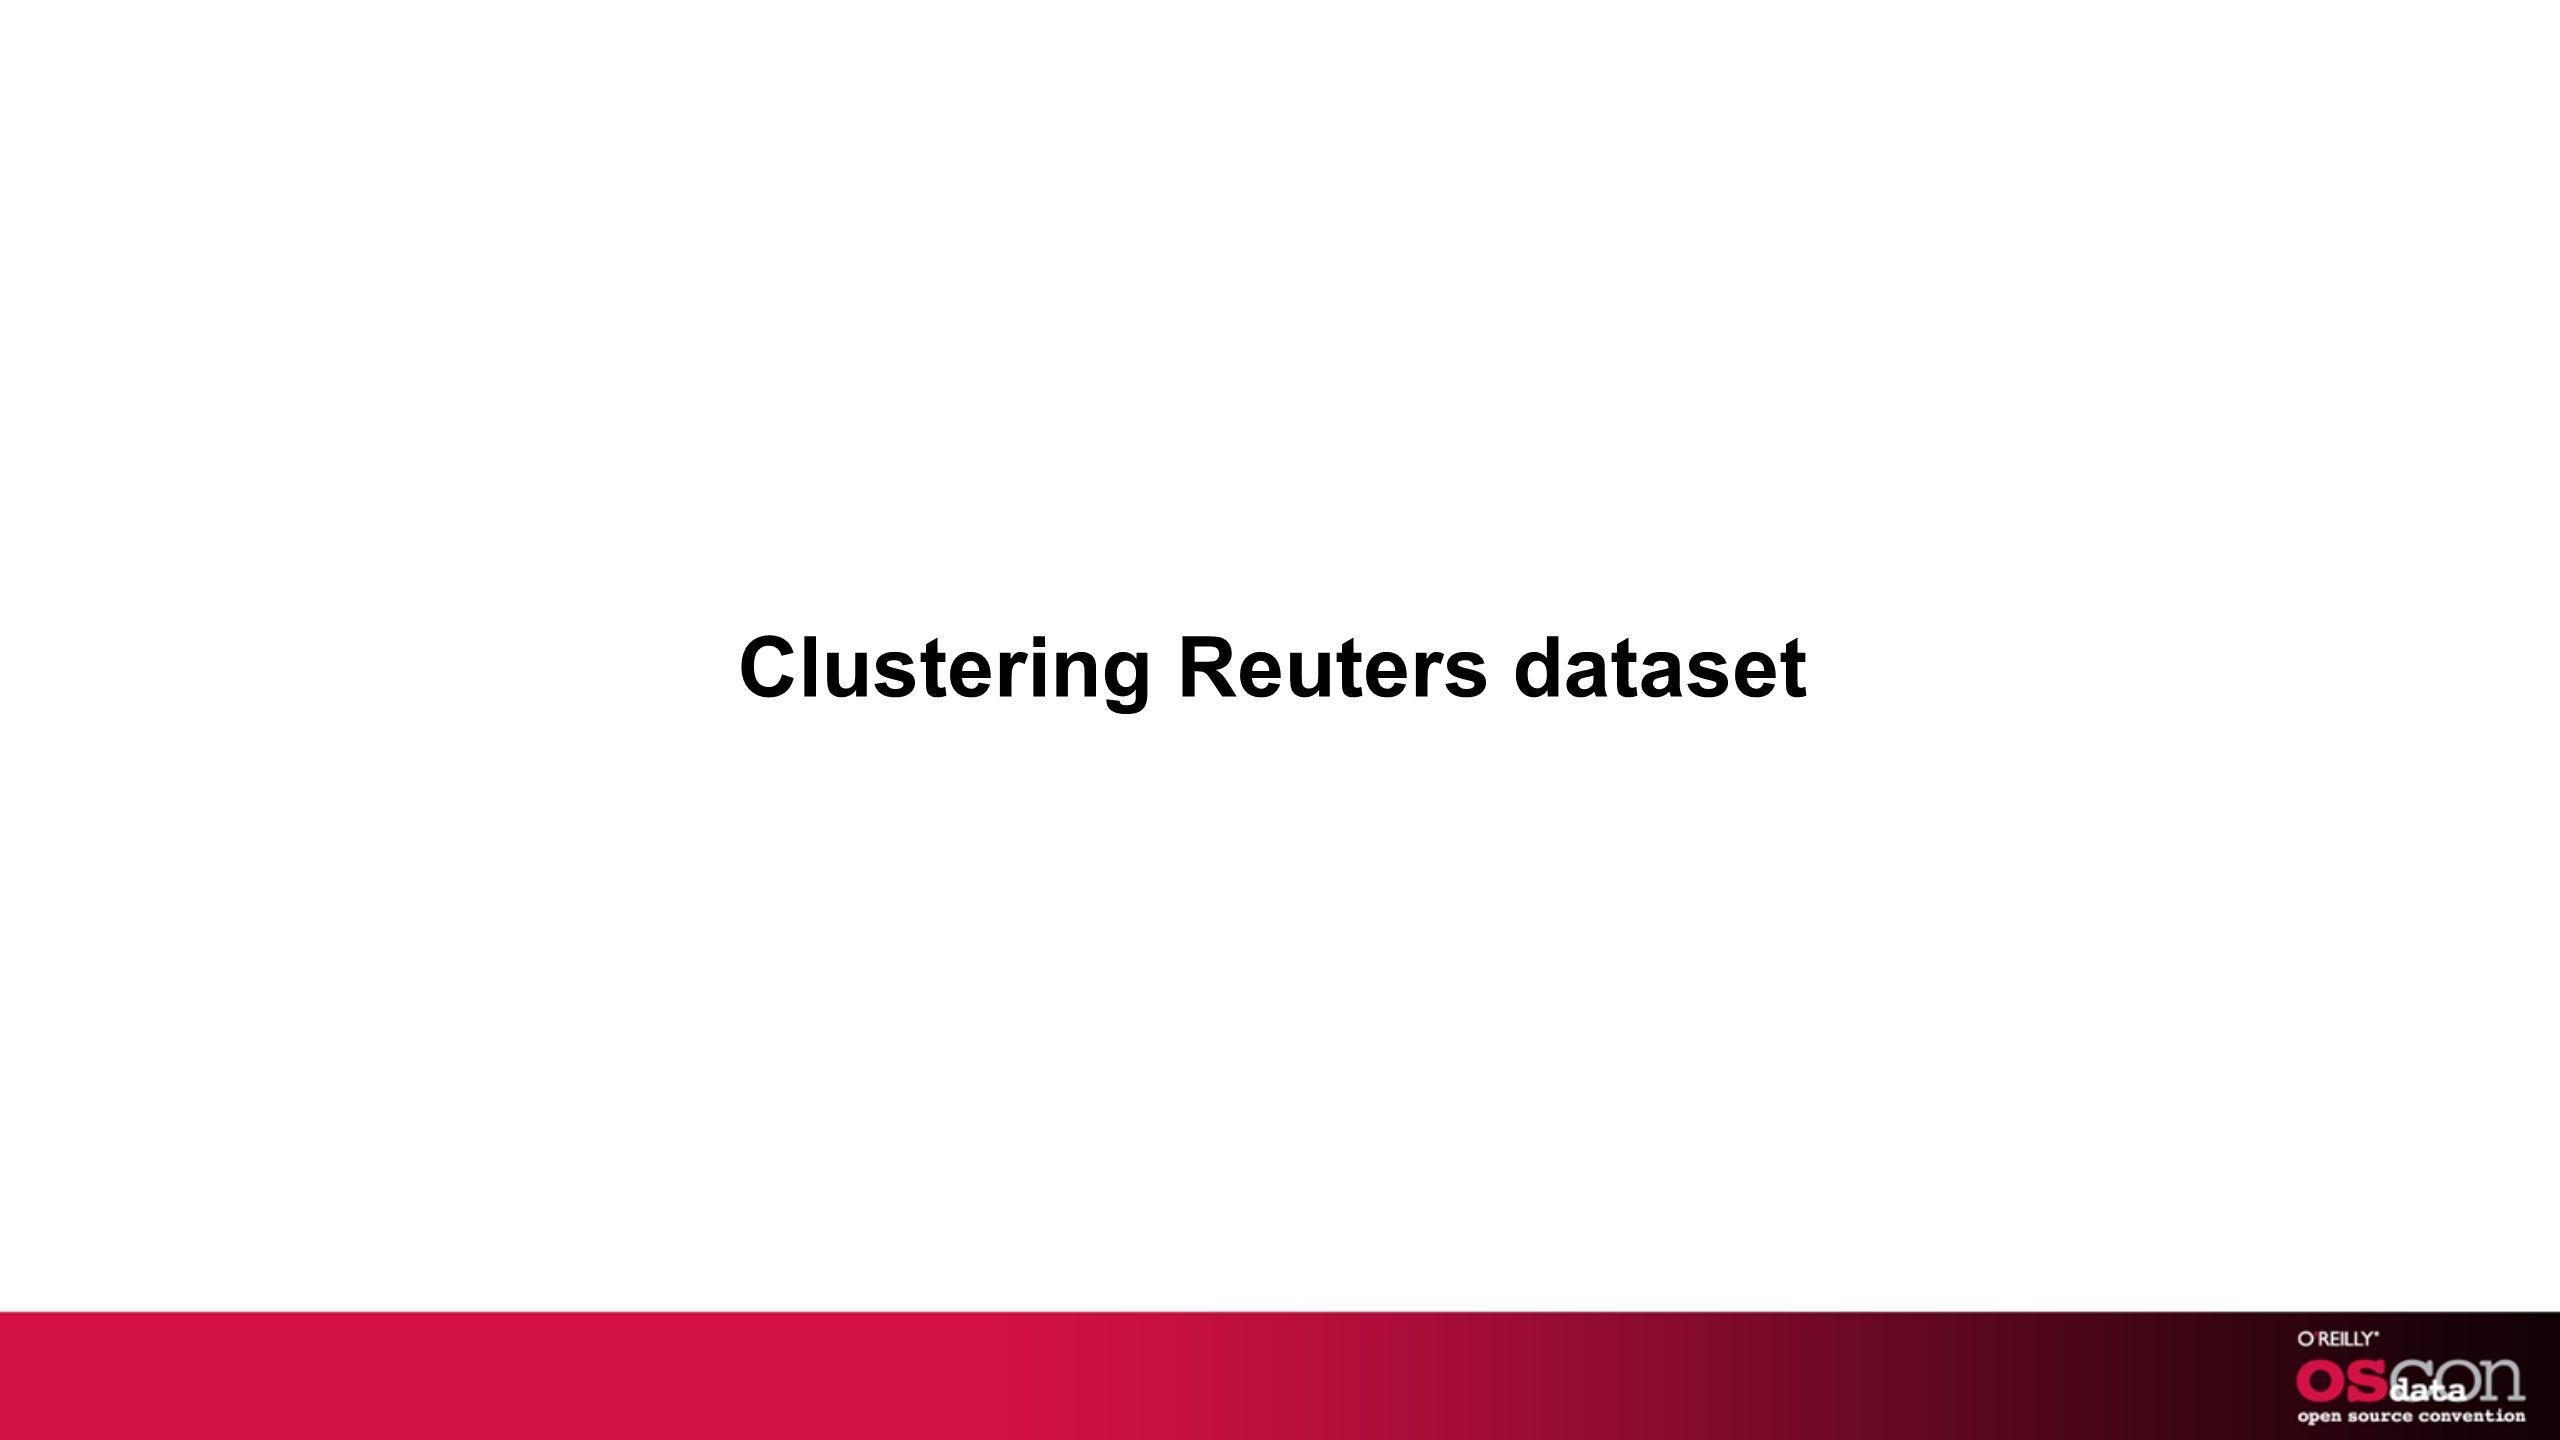 Clustering Reuters dataset